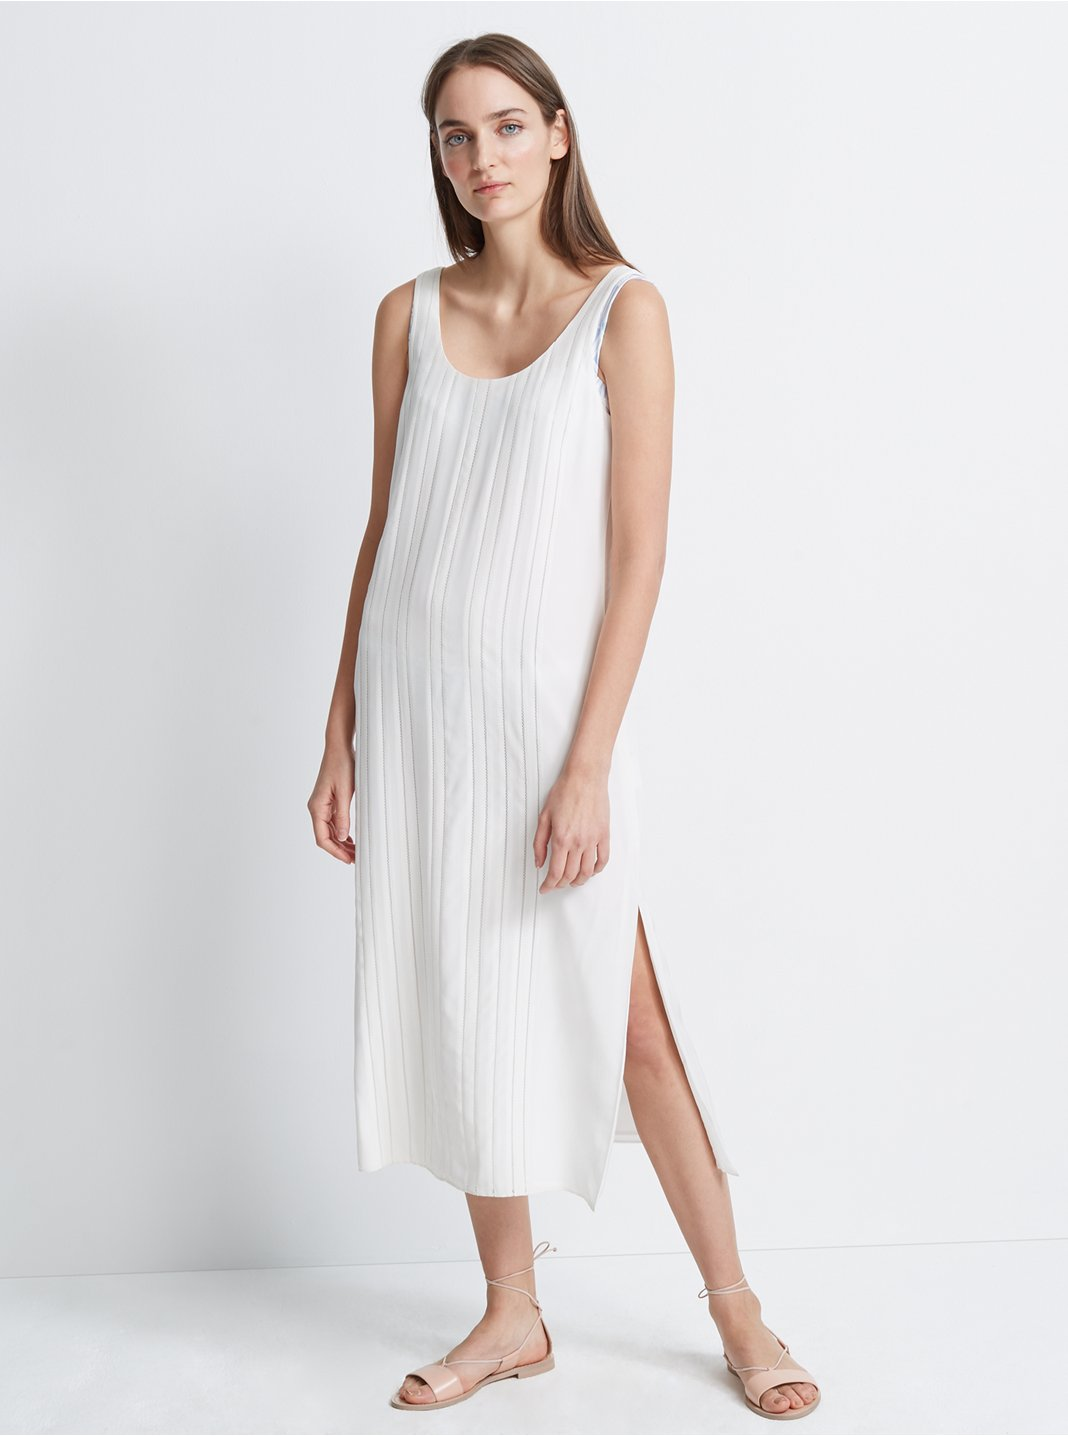 Lorrenah Silk Dress